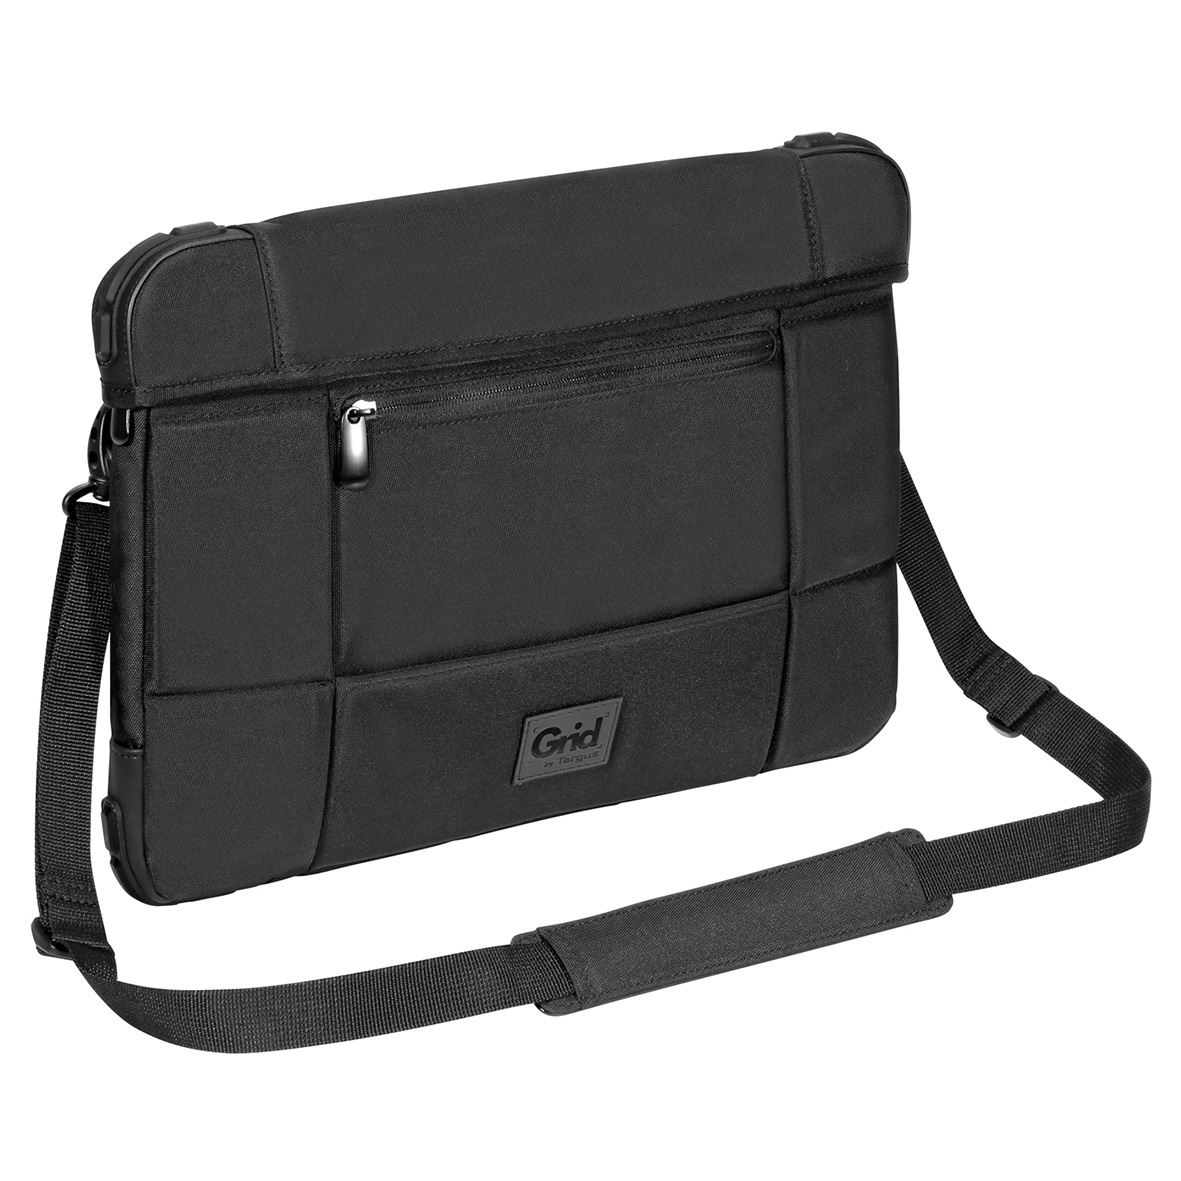 Targus 15.6-Inch Notebook Slip Cover Case - Black - (TSS845EU)